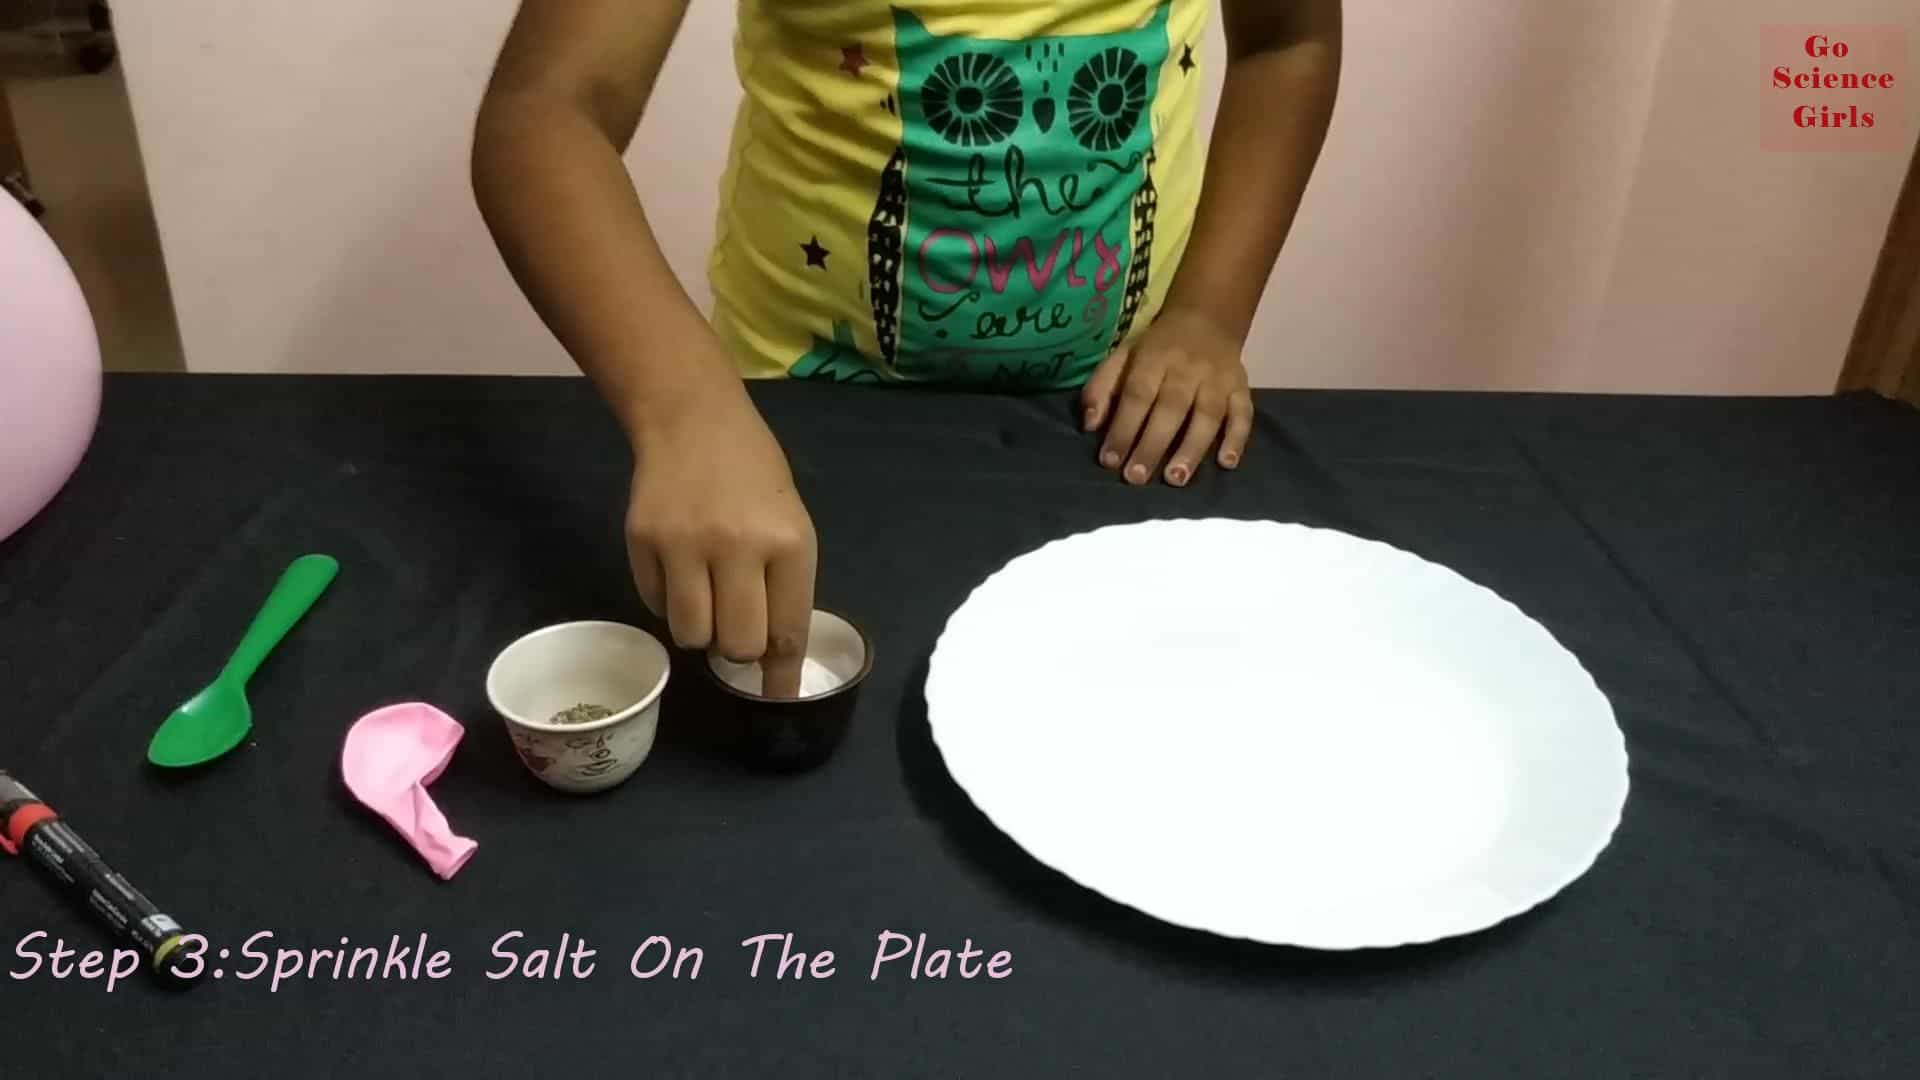 Sprinkle salt on the plate for balloon pepper salt experiment